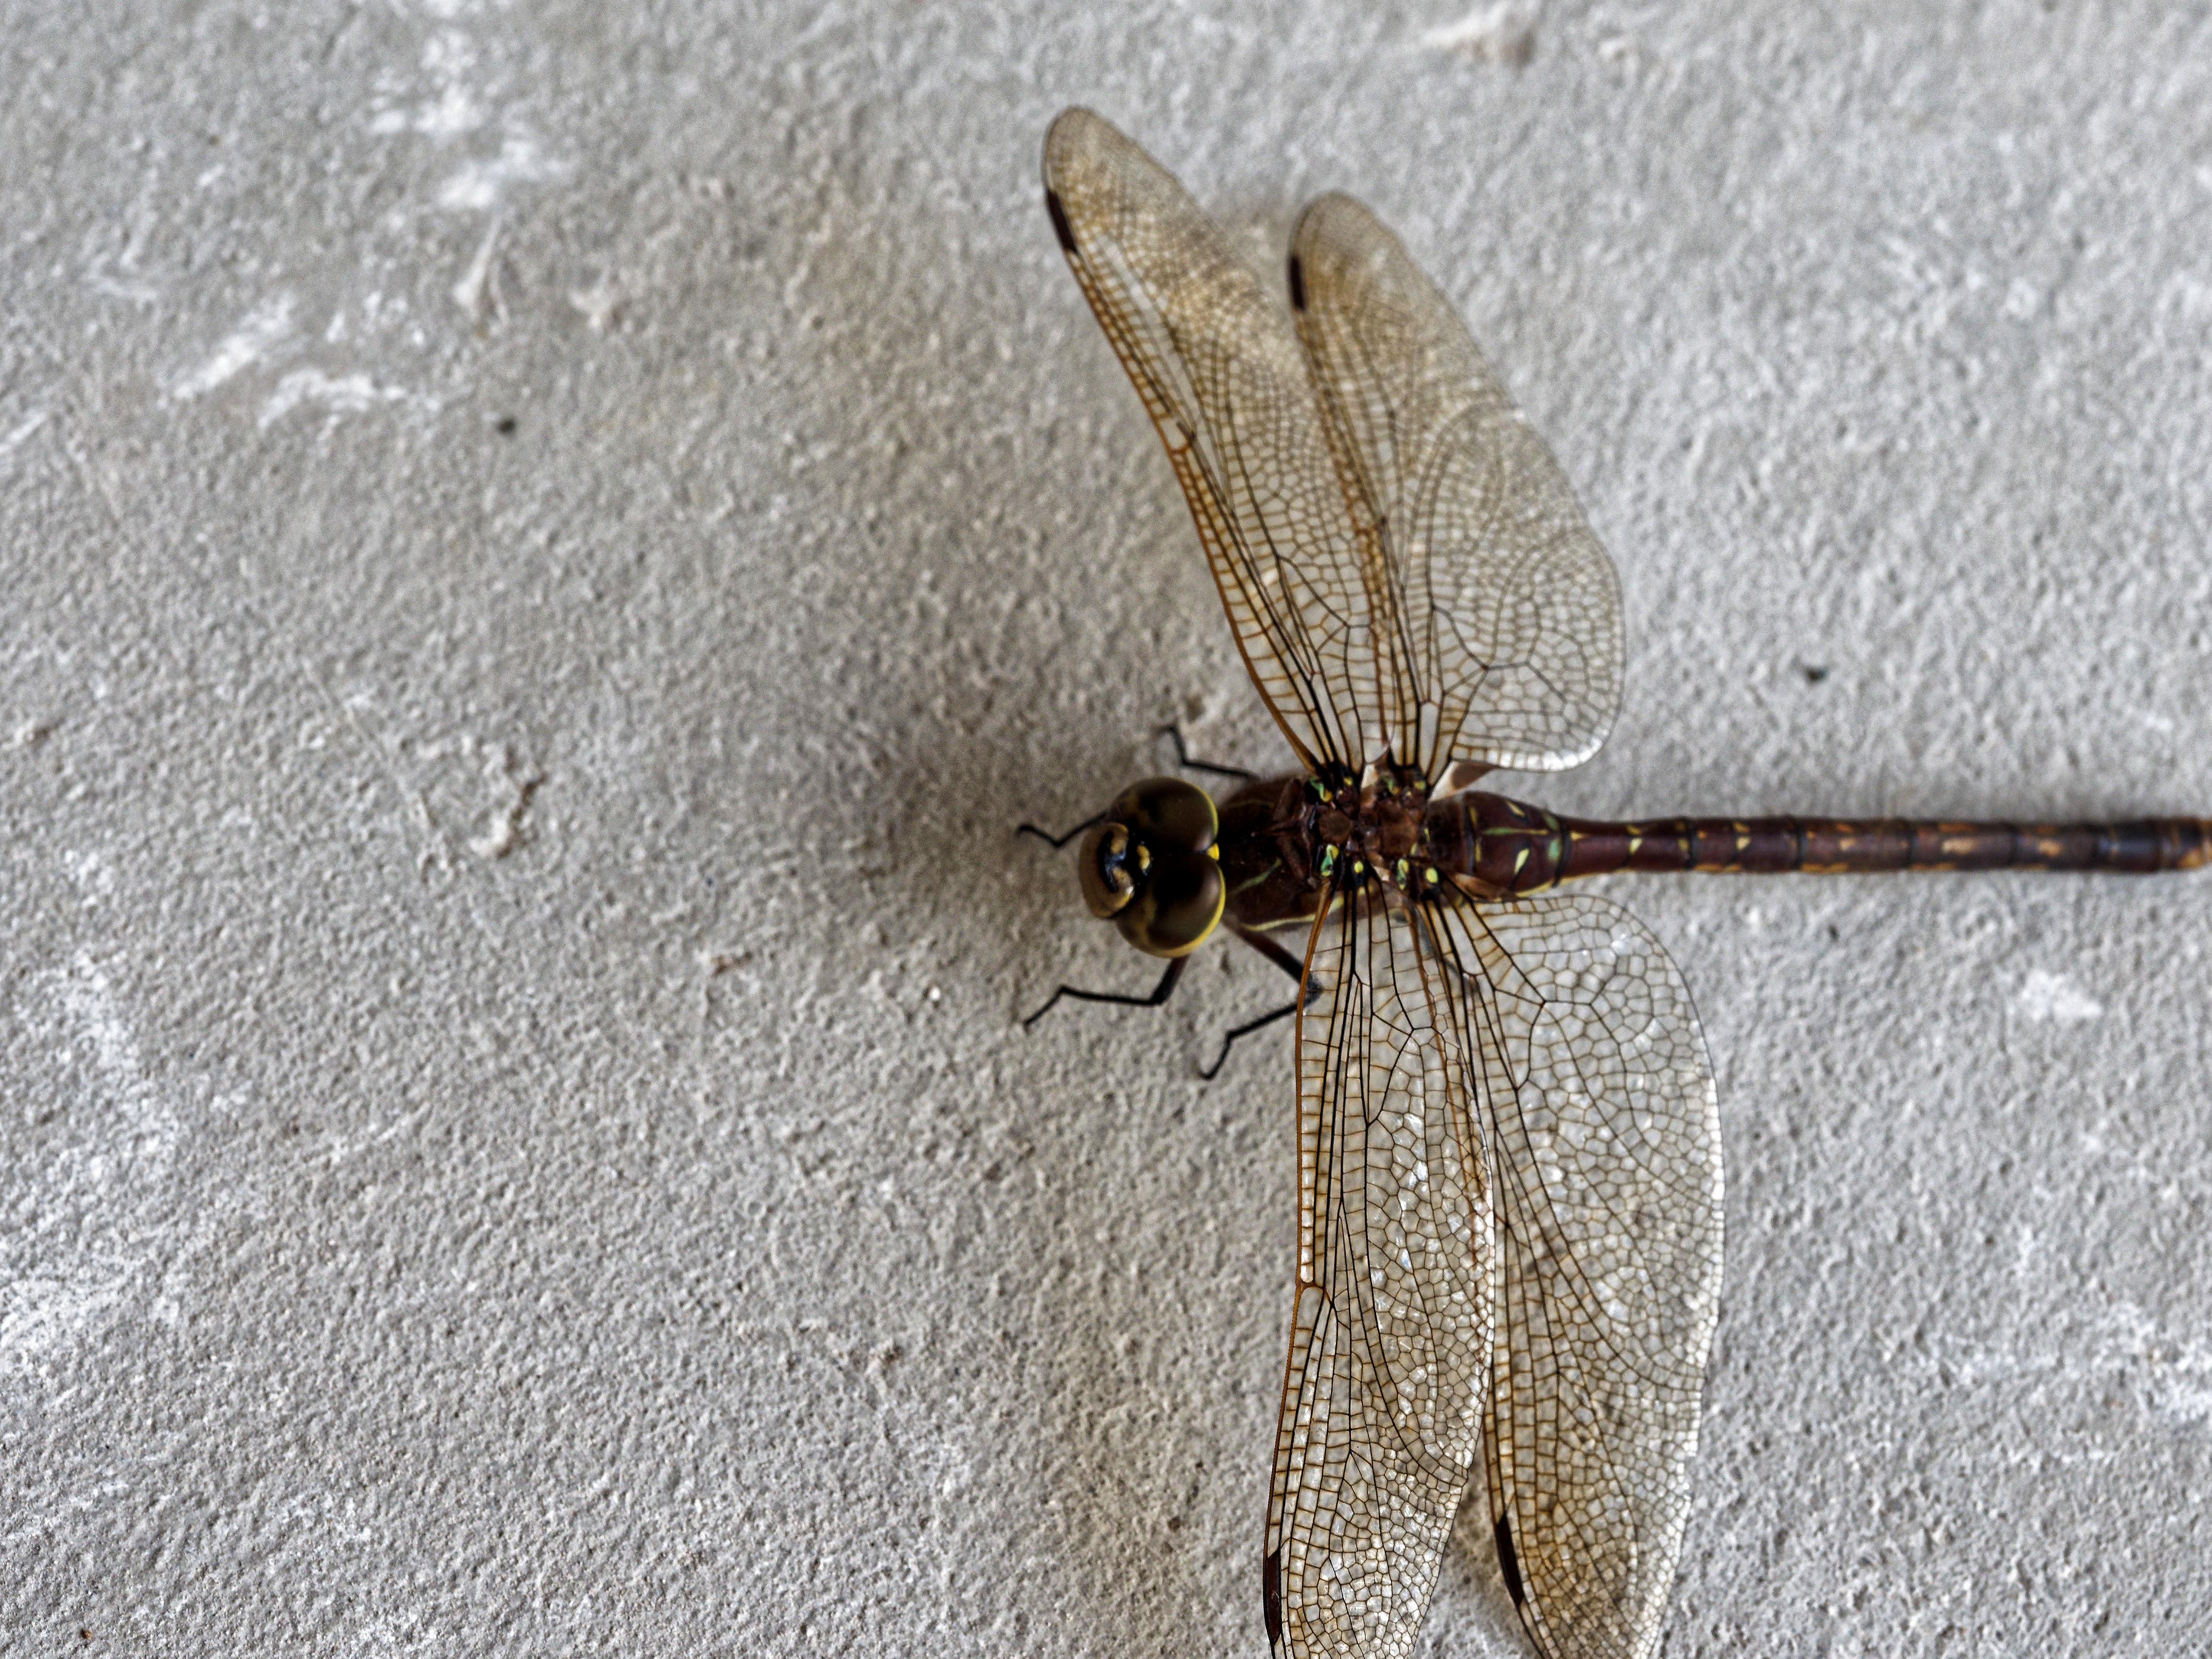 Dragon-fly-3.jpeg